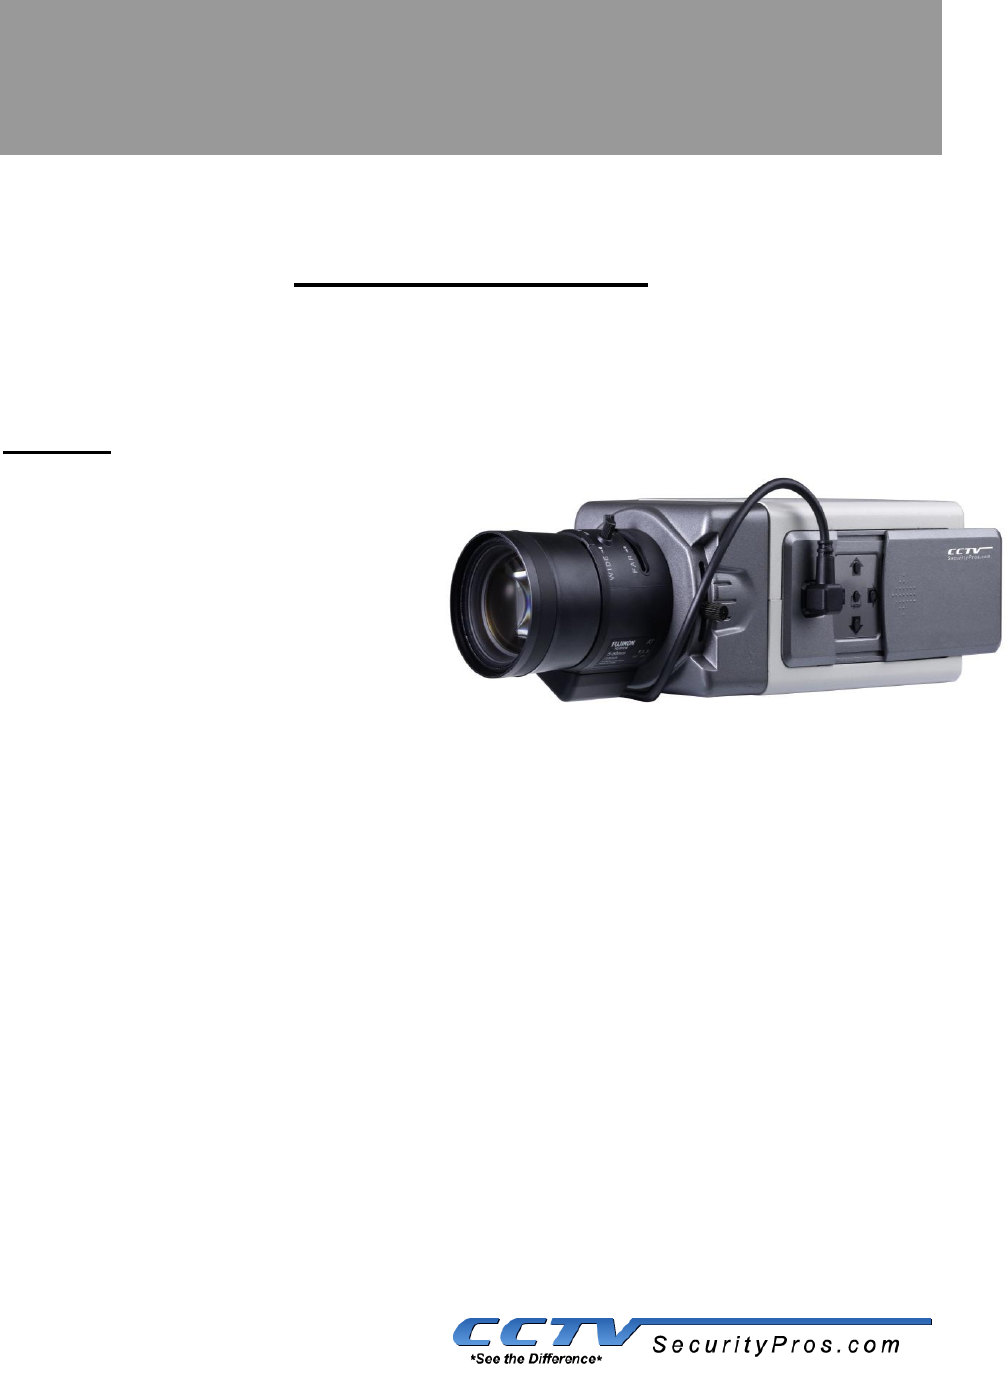 PB750 CSP on rj45 connector diagram, mazda tribute cruise control harness diagram, 12v diesel fuel schematics diagram, secondary ignition pickup sensor probe schematic diagram, cat5 diagram, mazda 6 throttle connection diagram,